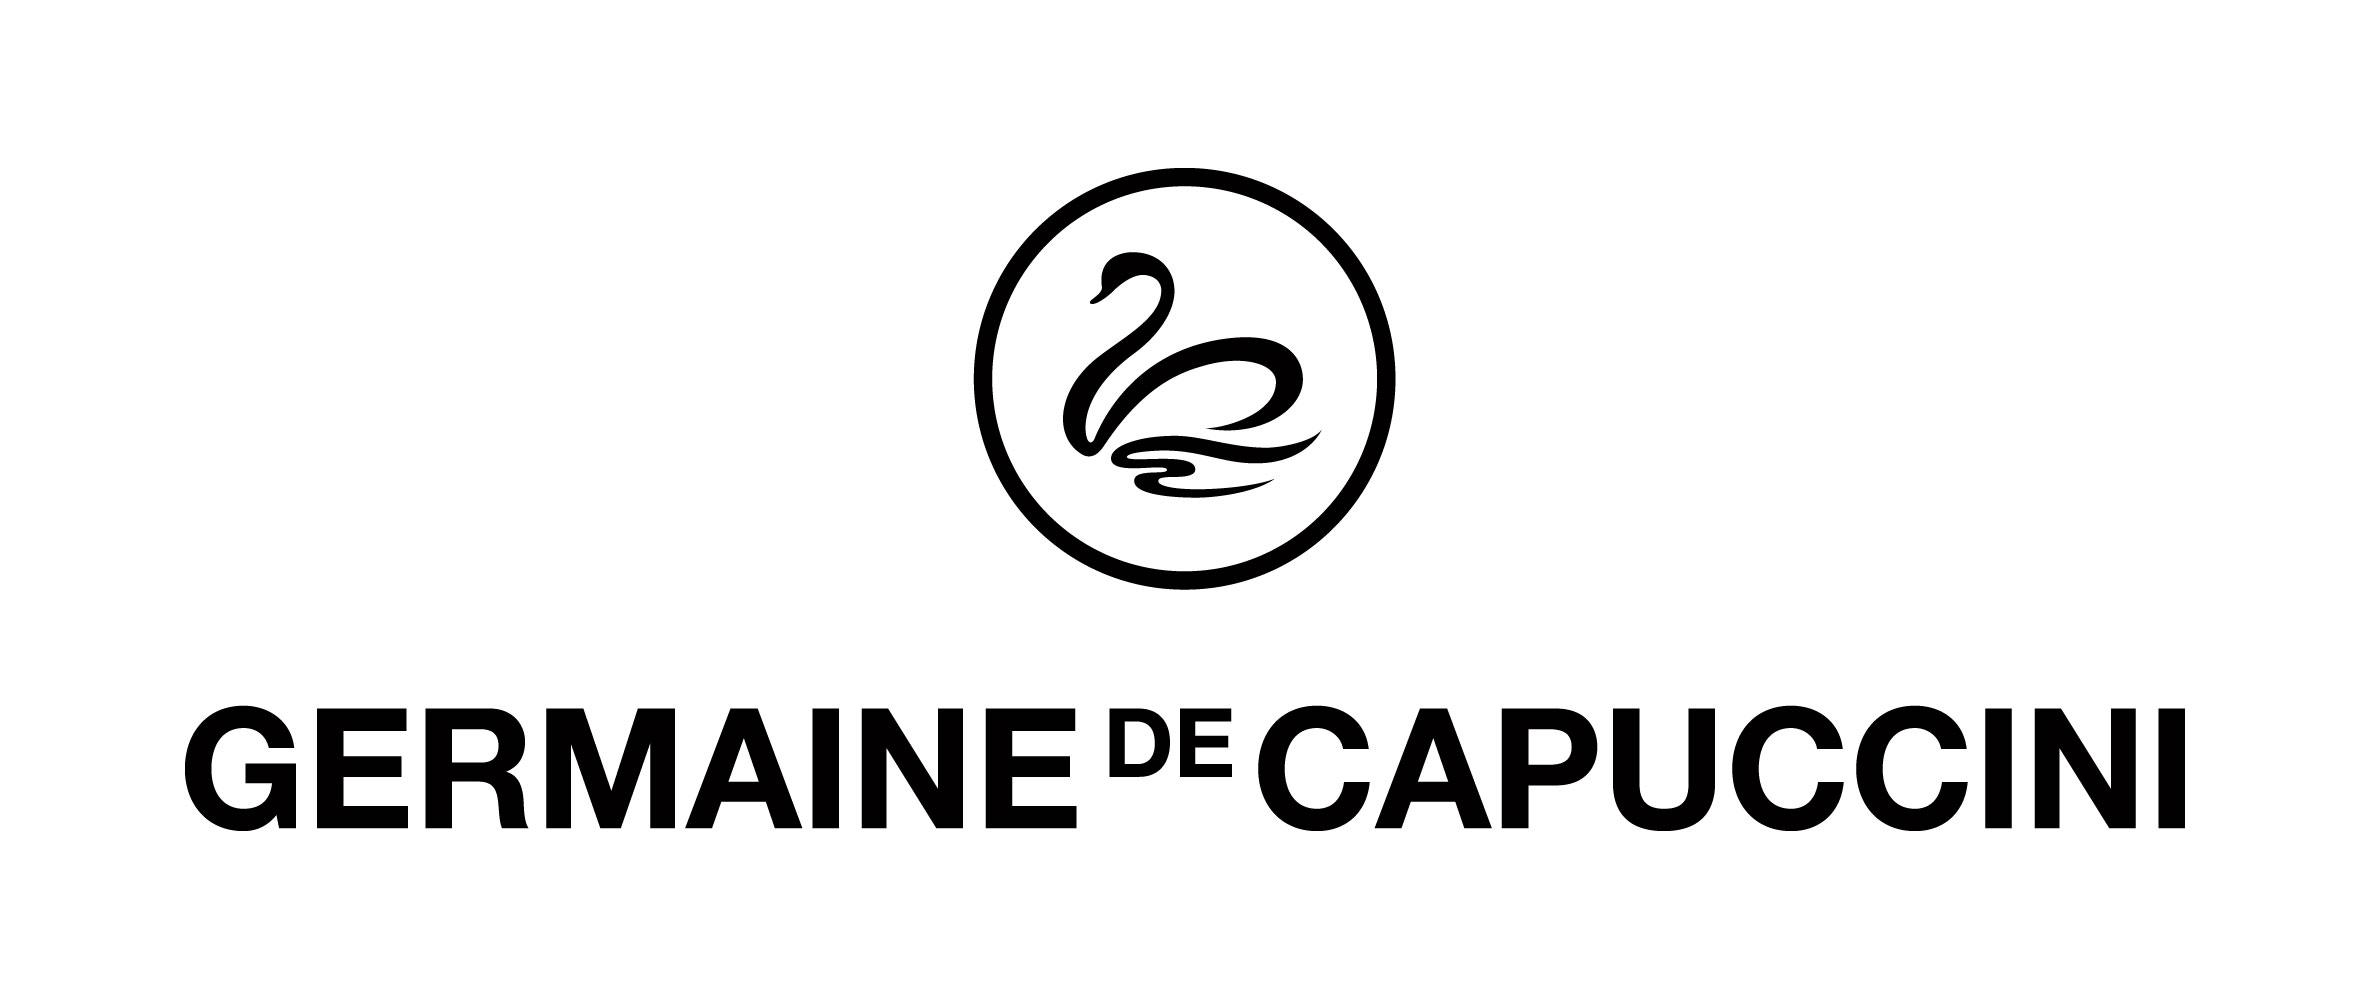 GdC-logo-Swan-black-white.jpg